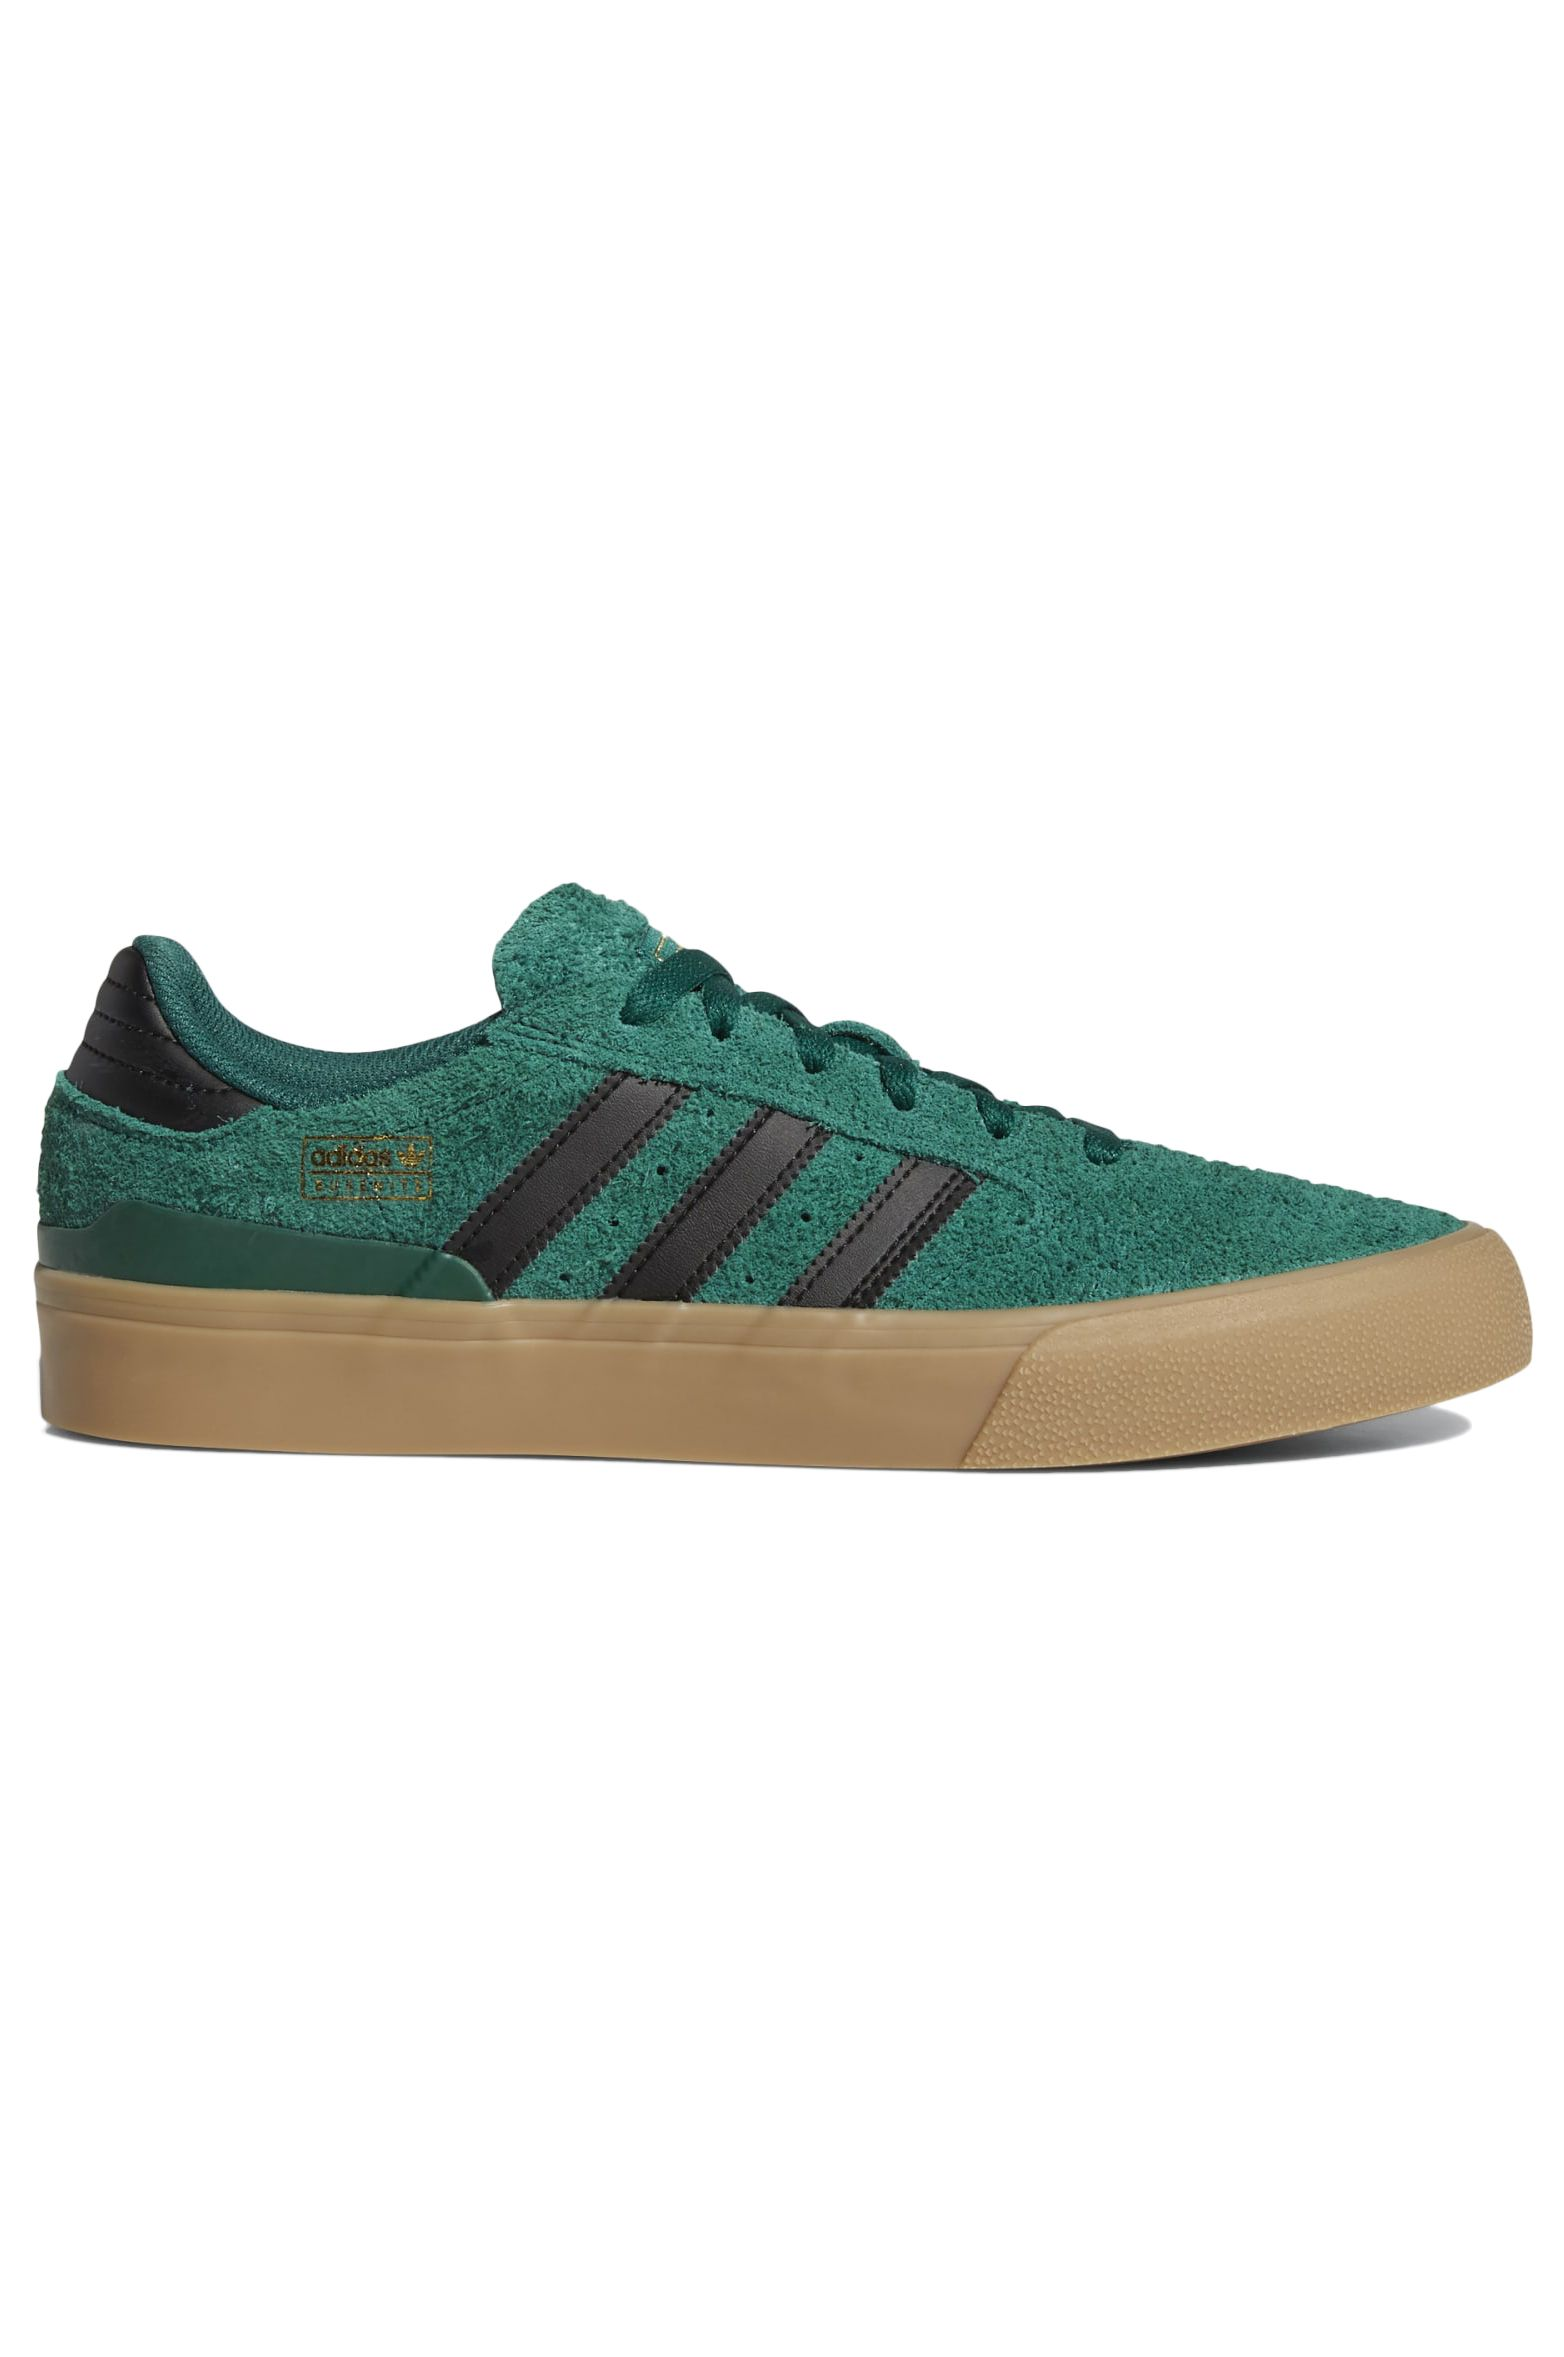 Adidas Shoes BUSENITZ VULC II Collegiate Green/Core Black/Gum4